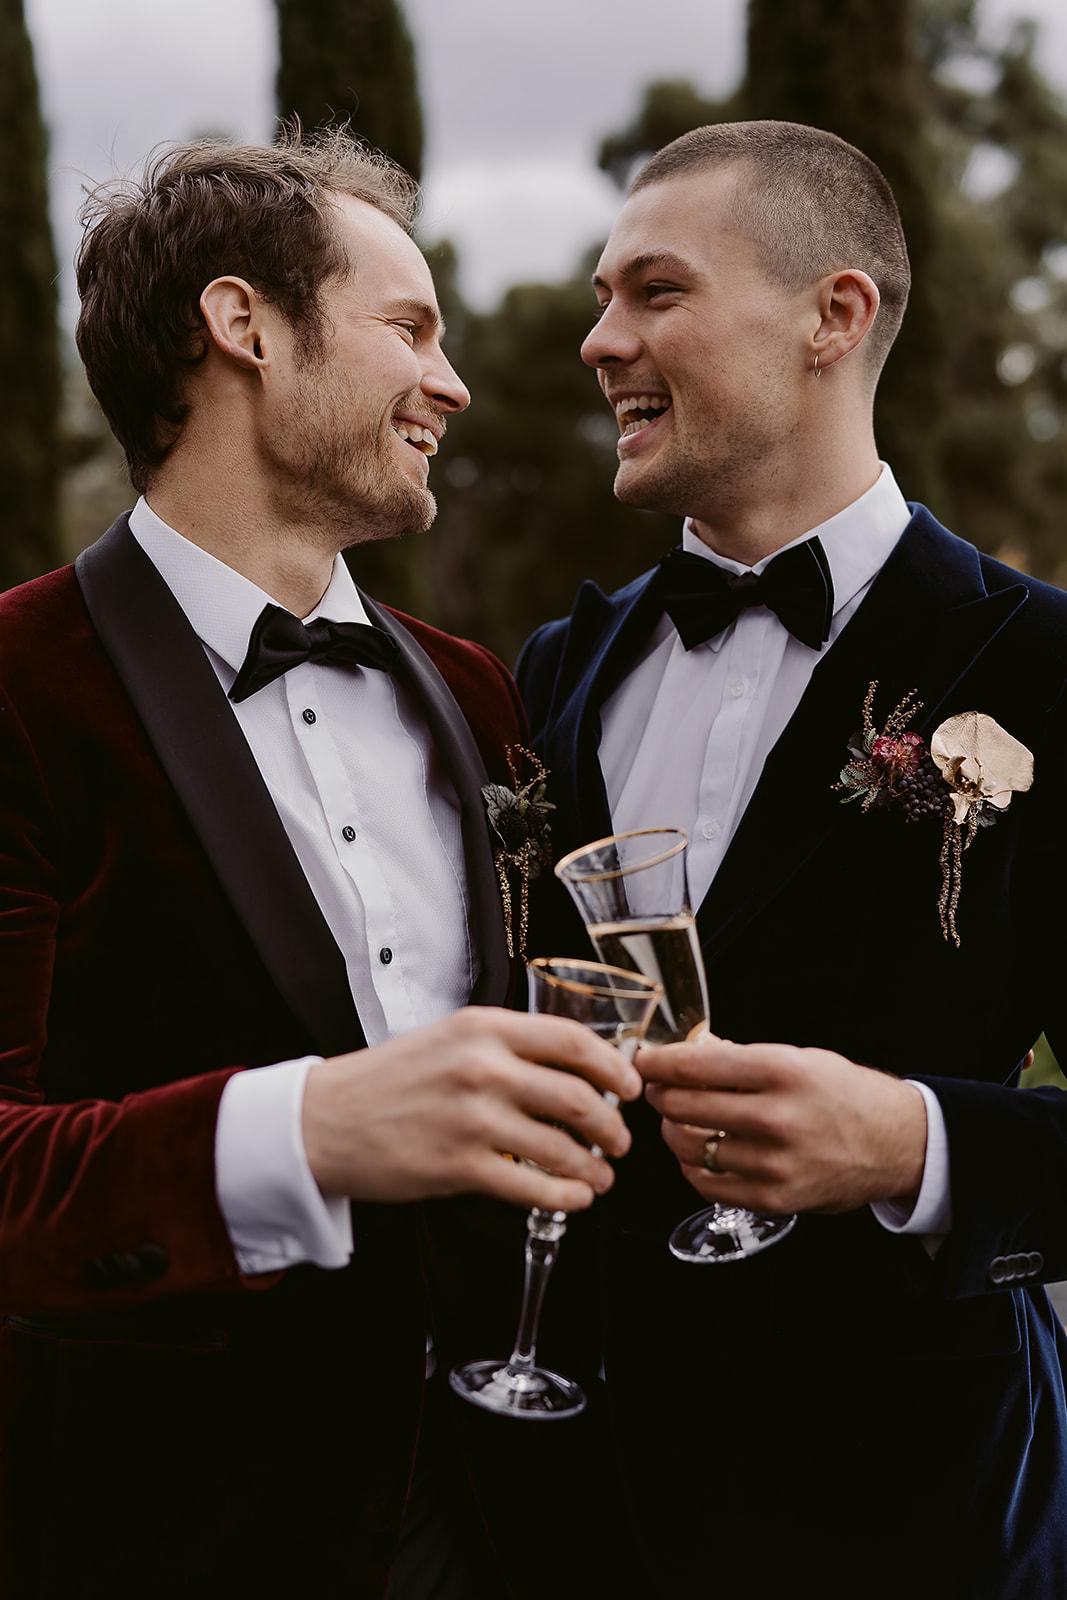 Immerse_Yarra_Valley_Same_Sex_Wedding_-_Ashleigh_Haase_Photography-73.jpg